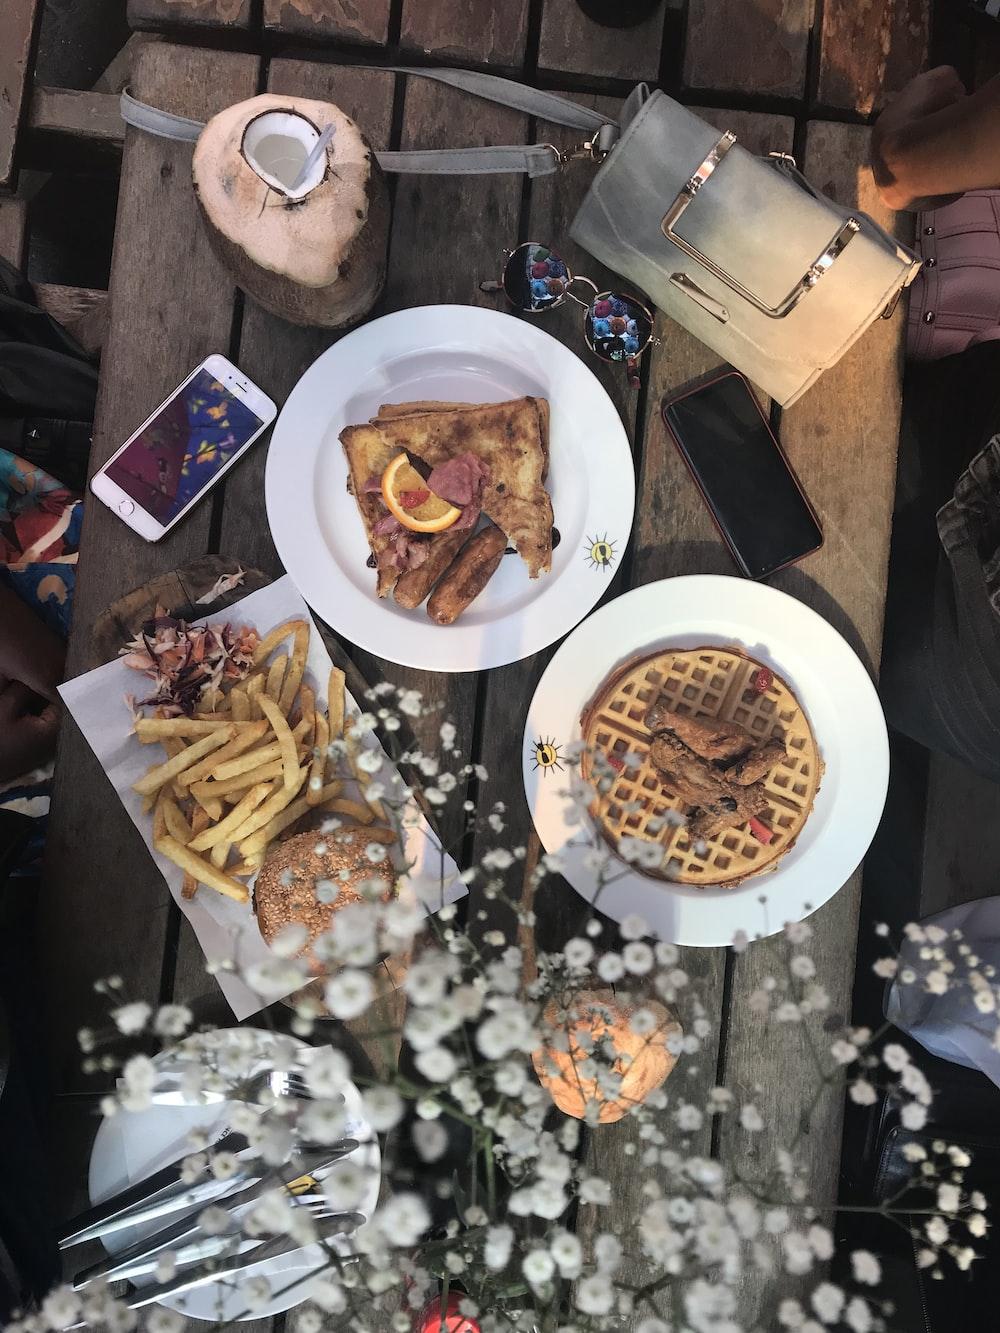 baked waffles on round white ceramic plates during daytime